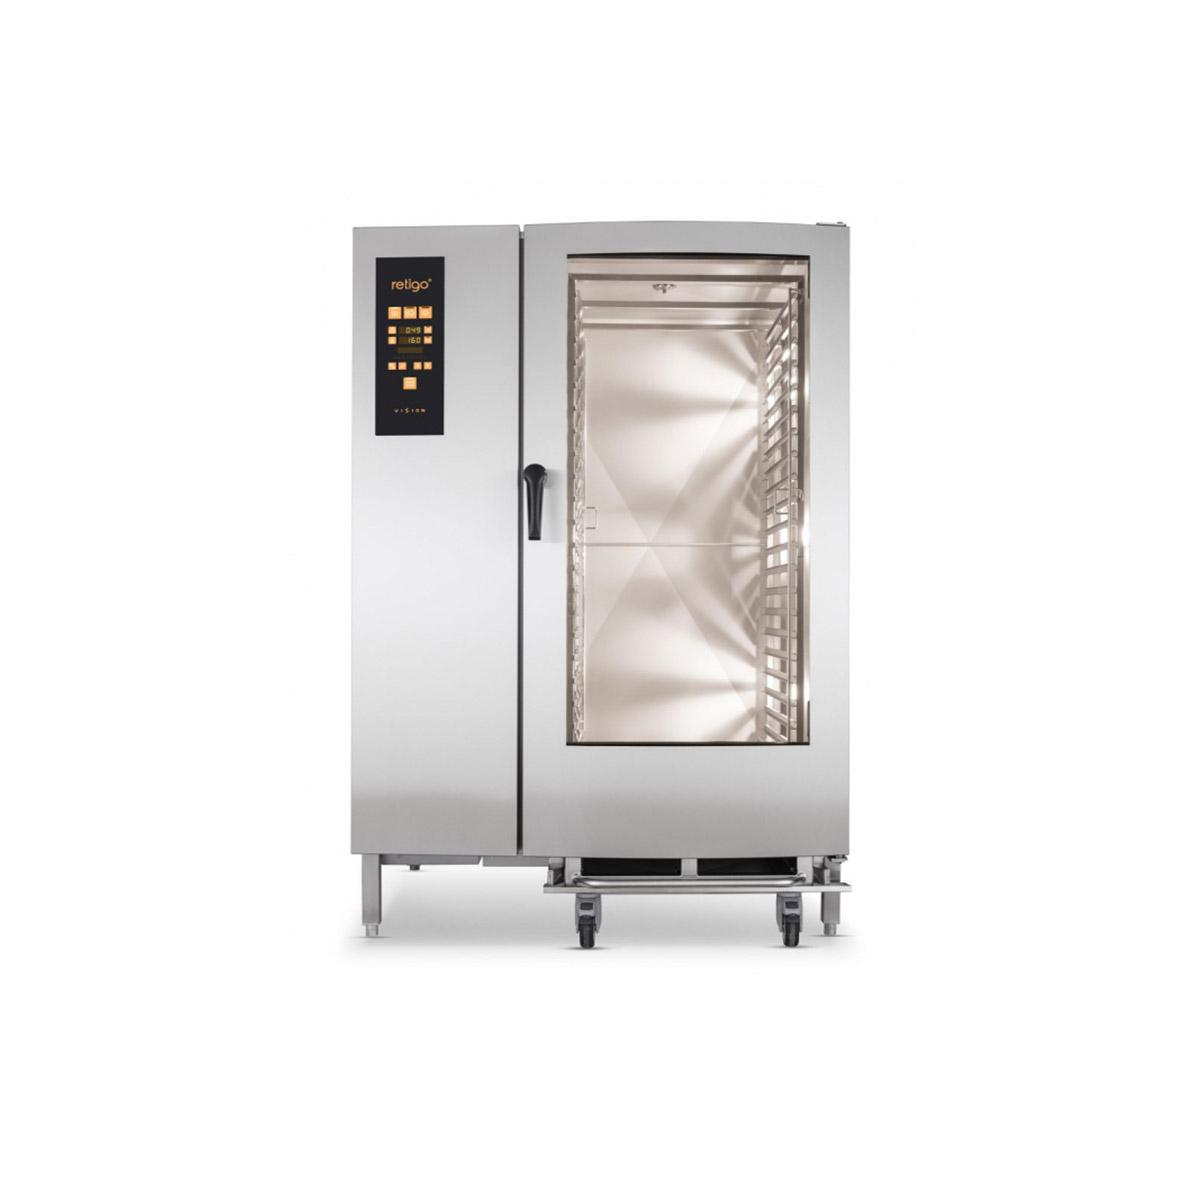 Retigo Orange Vision Combination Oven O2021b